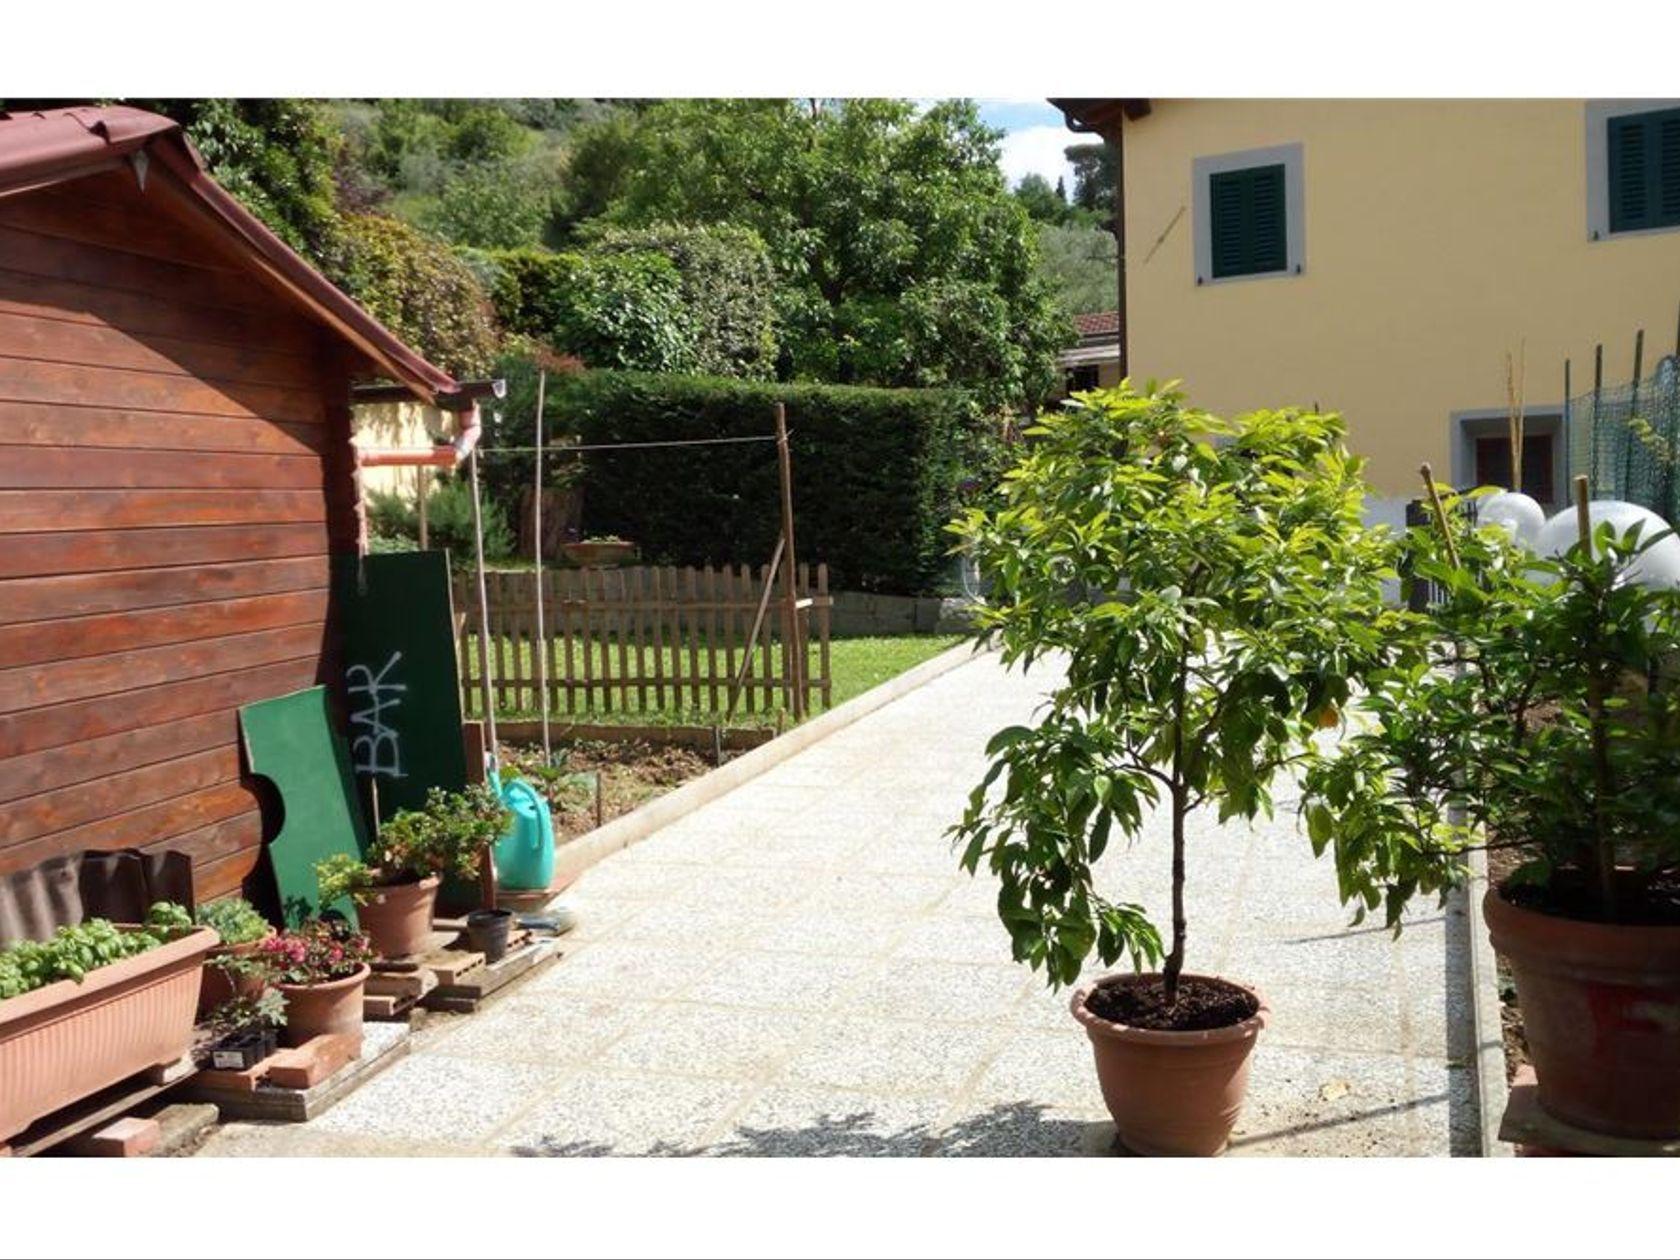 Appartamento Firenze - Firenze Sud Gavinana Europa, Firenze, FI Vendita - Foto 23